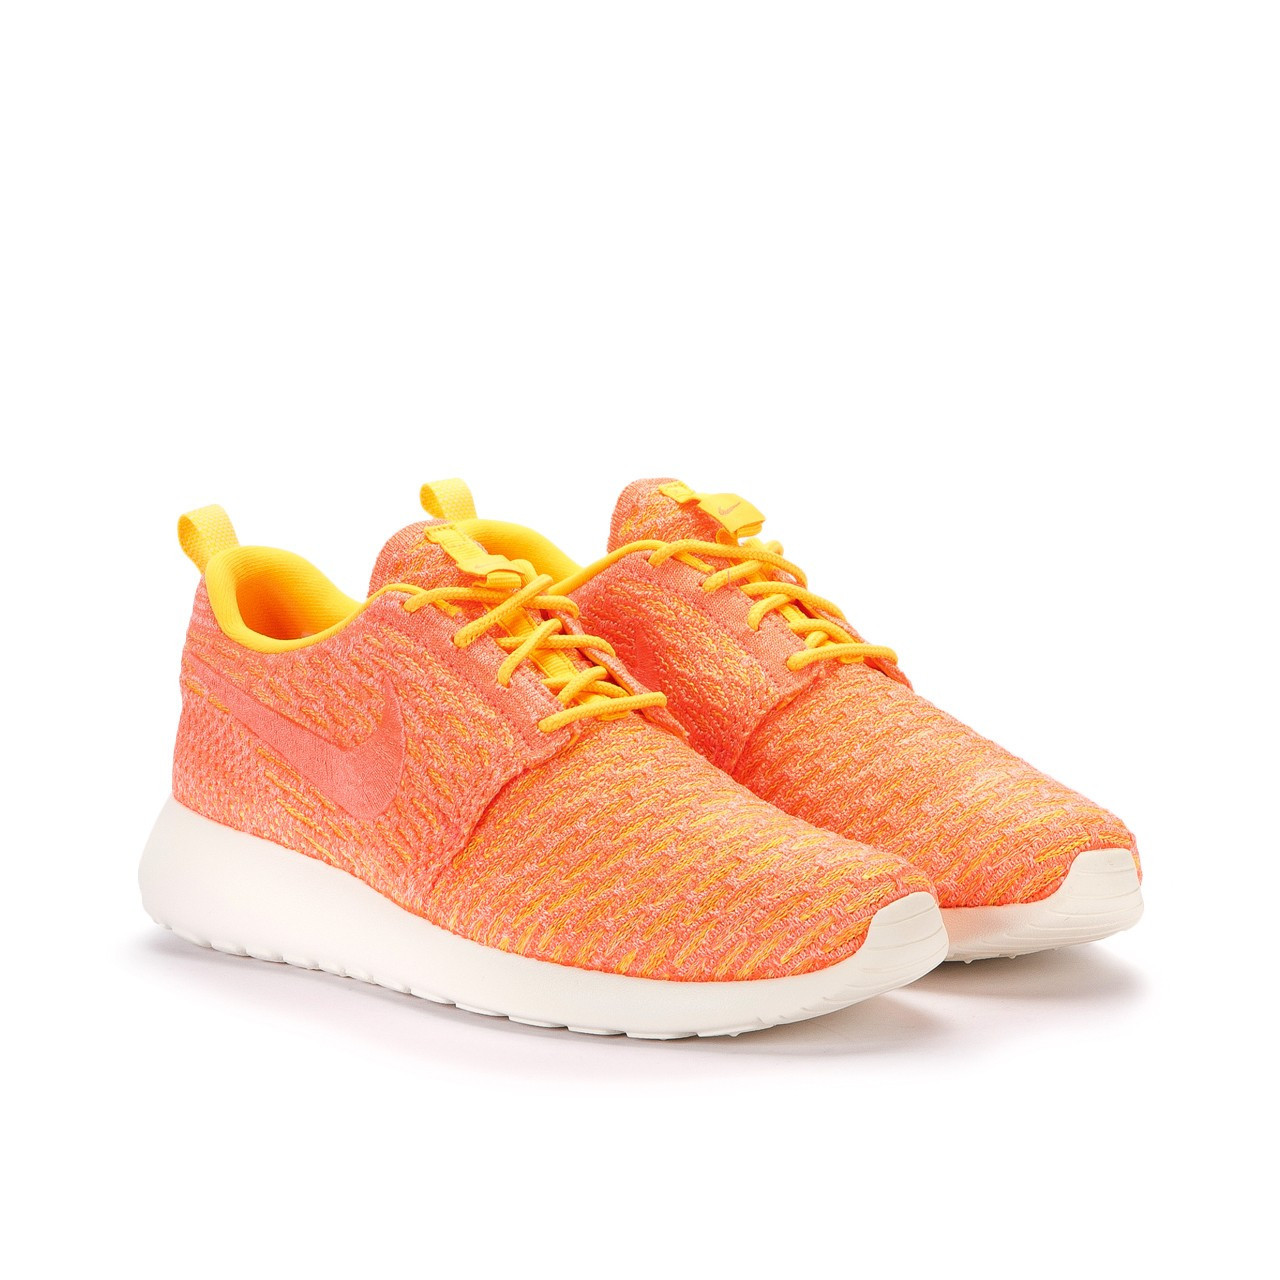 Кроссовки Nike Roshe One Flyknit